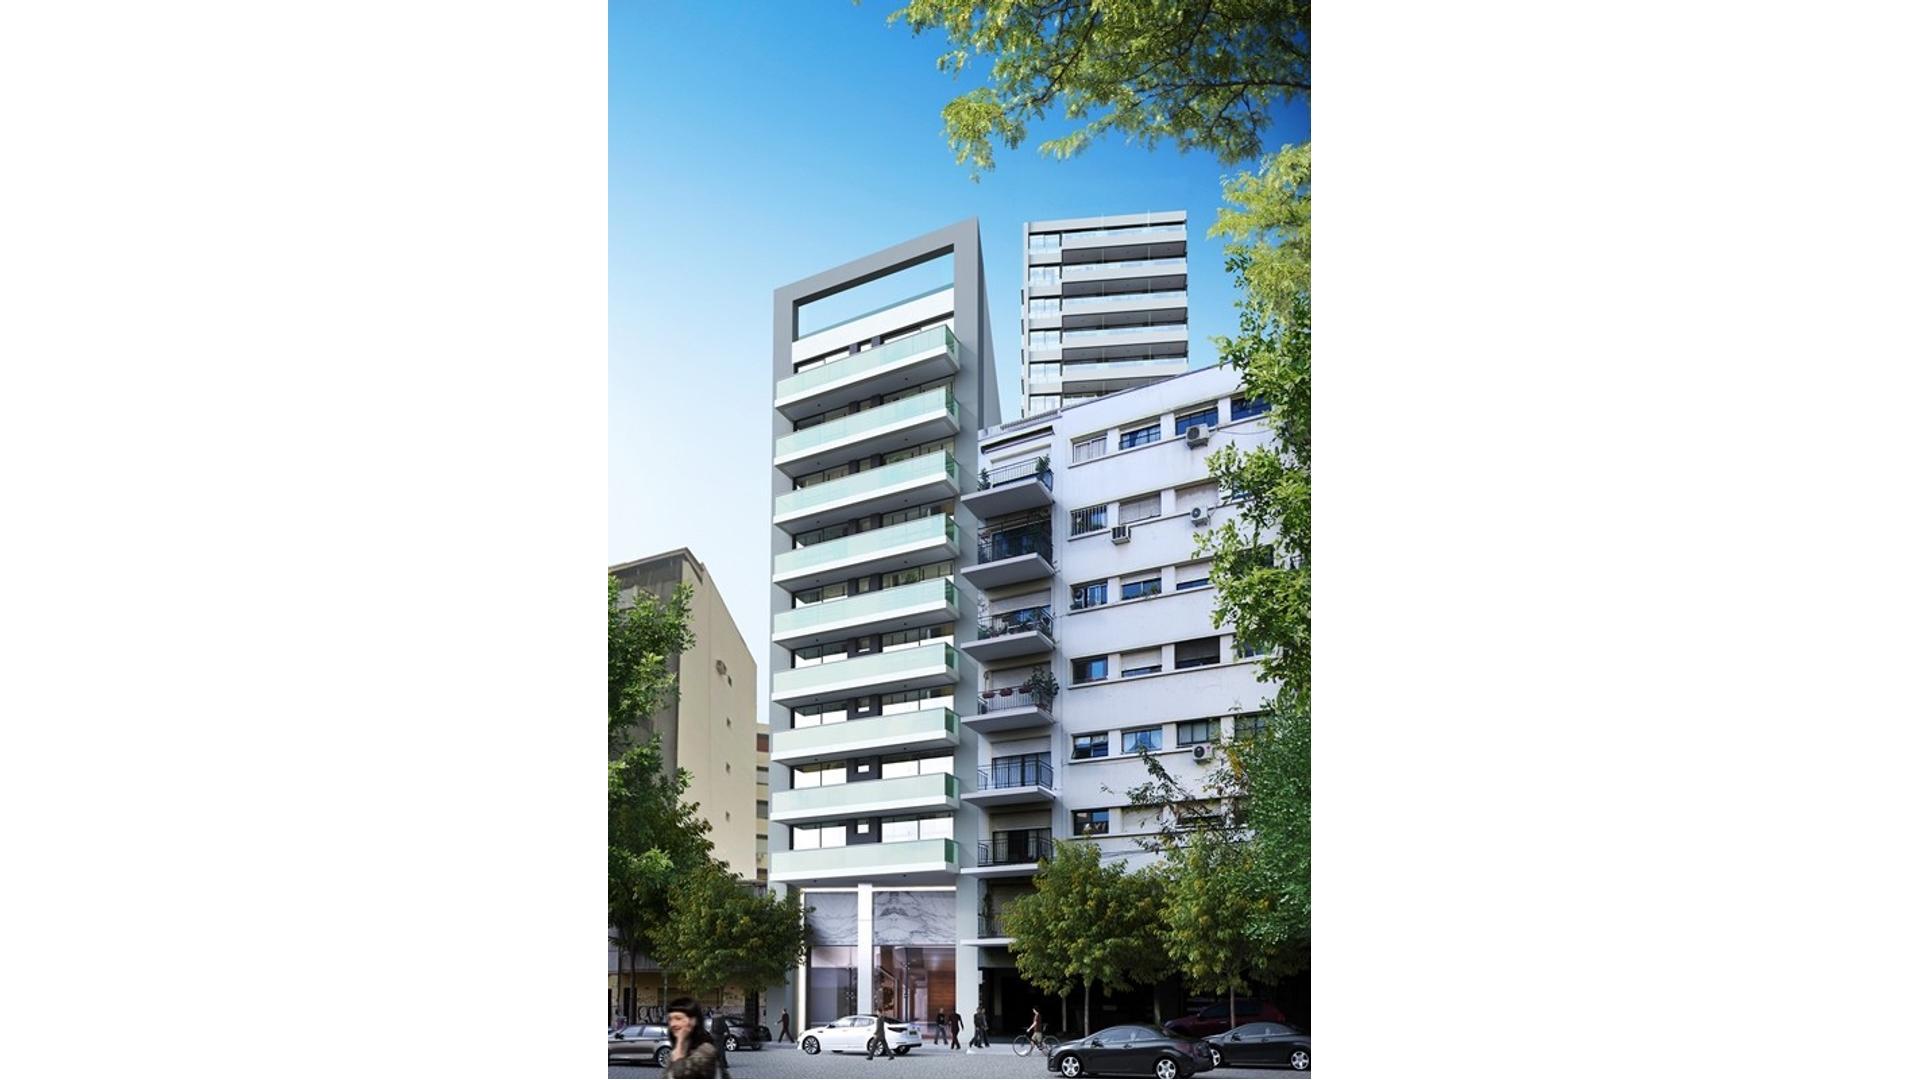 Departamento - Venta - Argentina, Capital Federal - ALBERDI, JUAN B., AV.  AL 800